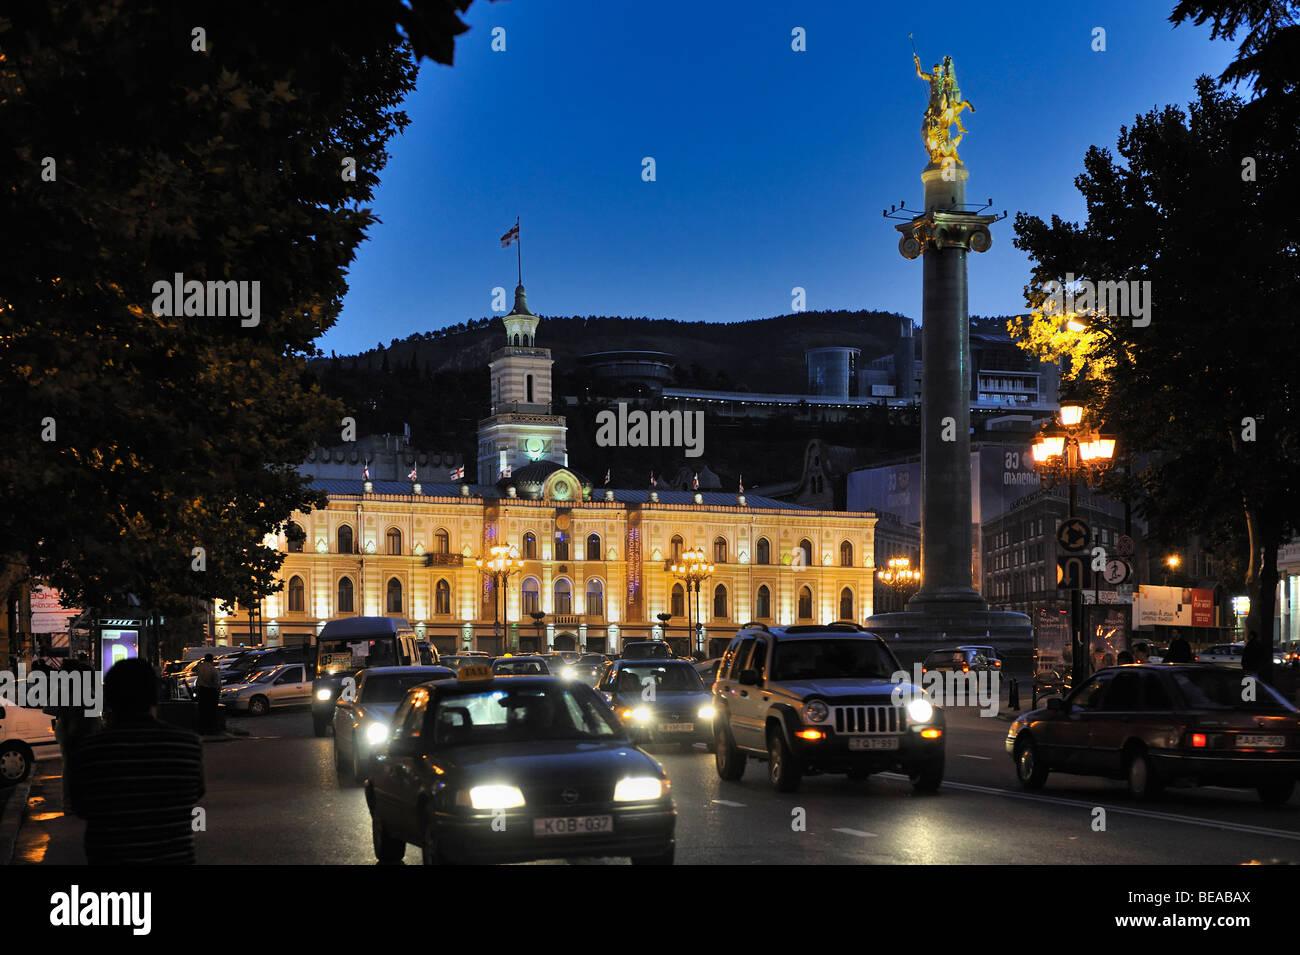 night shot of illuminated townhall or municipality of Tbilisi, Georgia Stock Photo